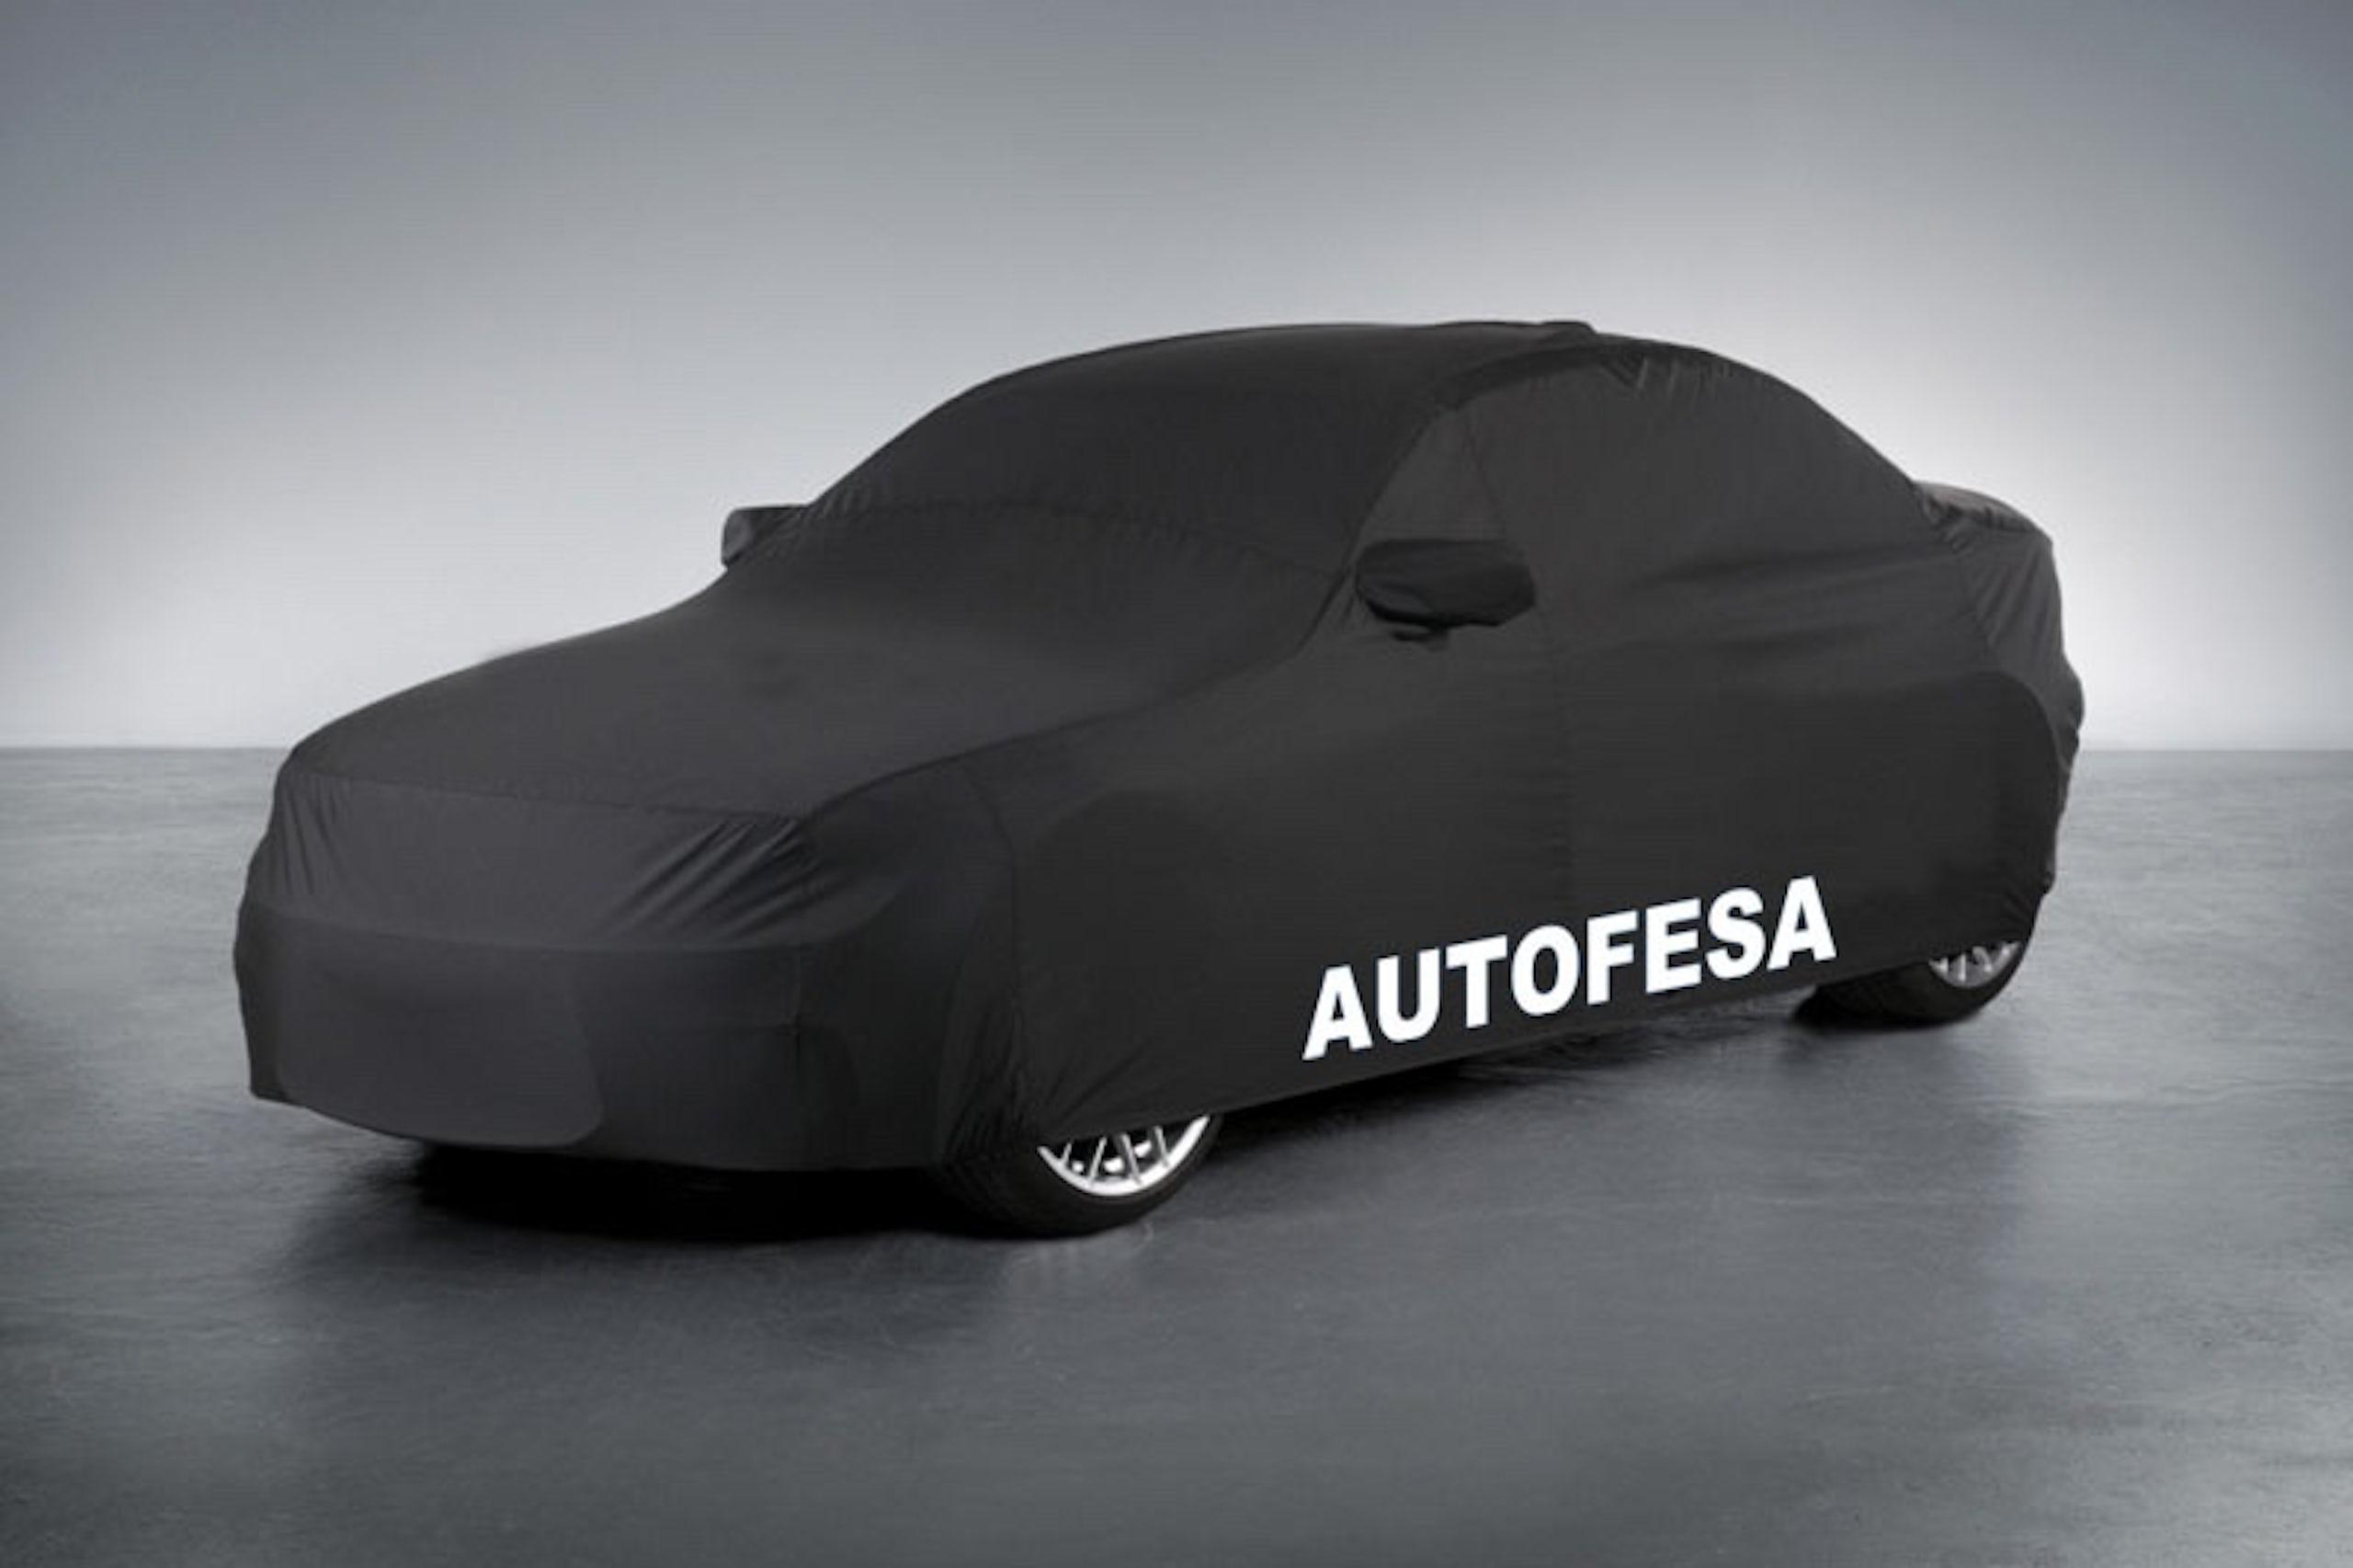 Peugeot Rcz 2.0 HDi 163cv Asphalt 2p FAP - Foto 17